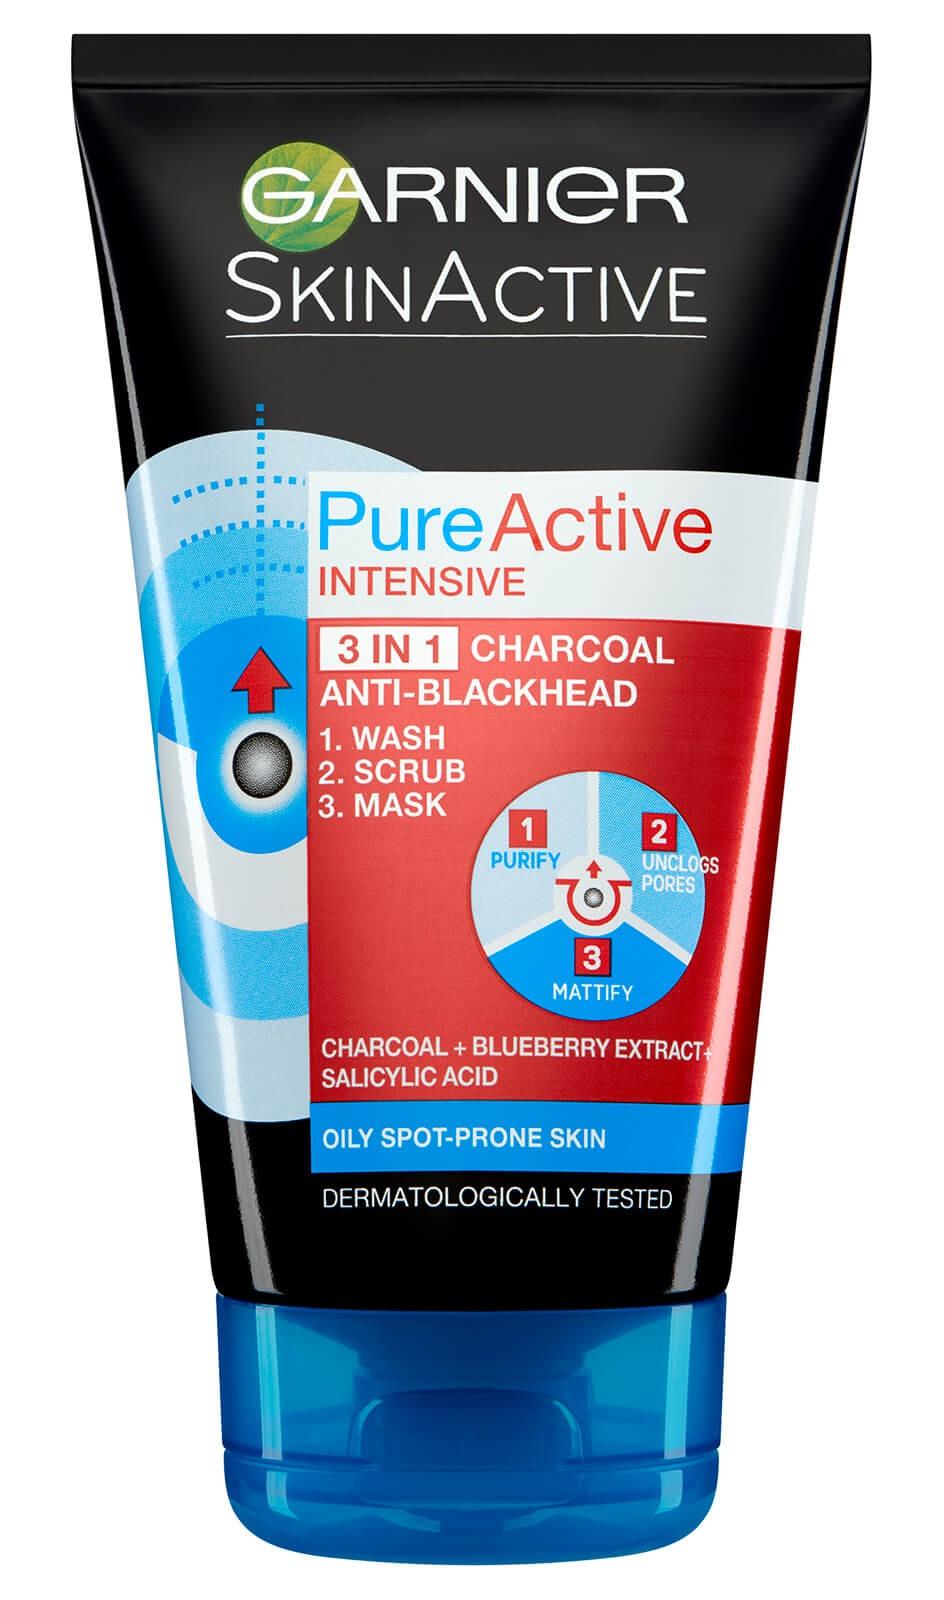 Garnier Pure Active Intensive 3 In 1 Anti-Blackhead Charcoal Wash, Scrub And Mask